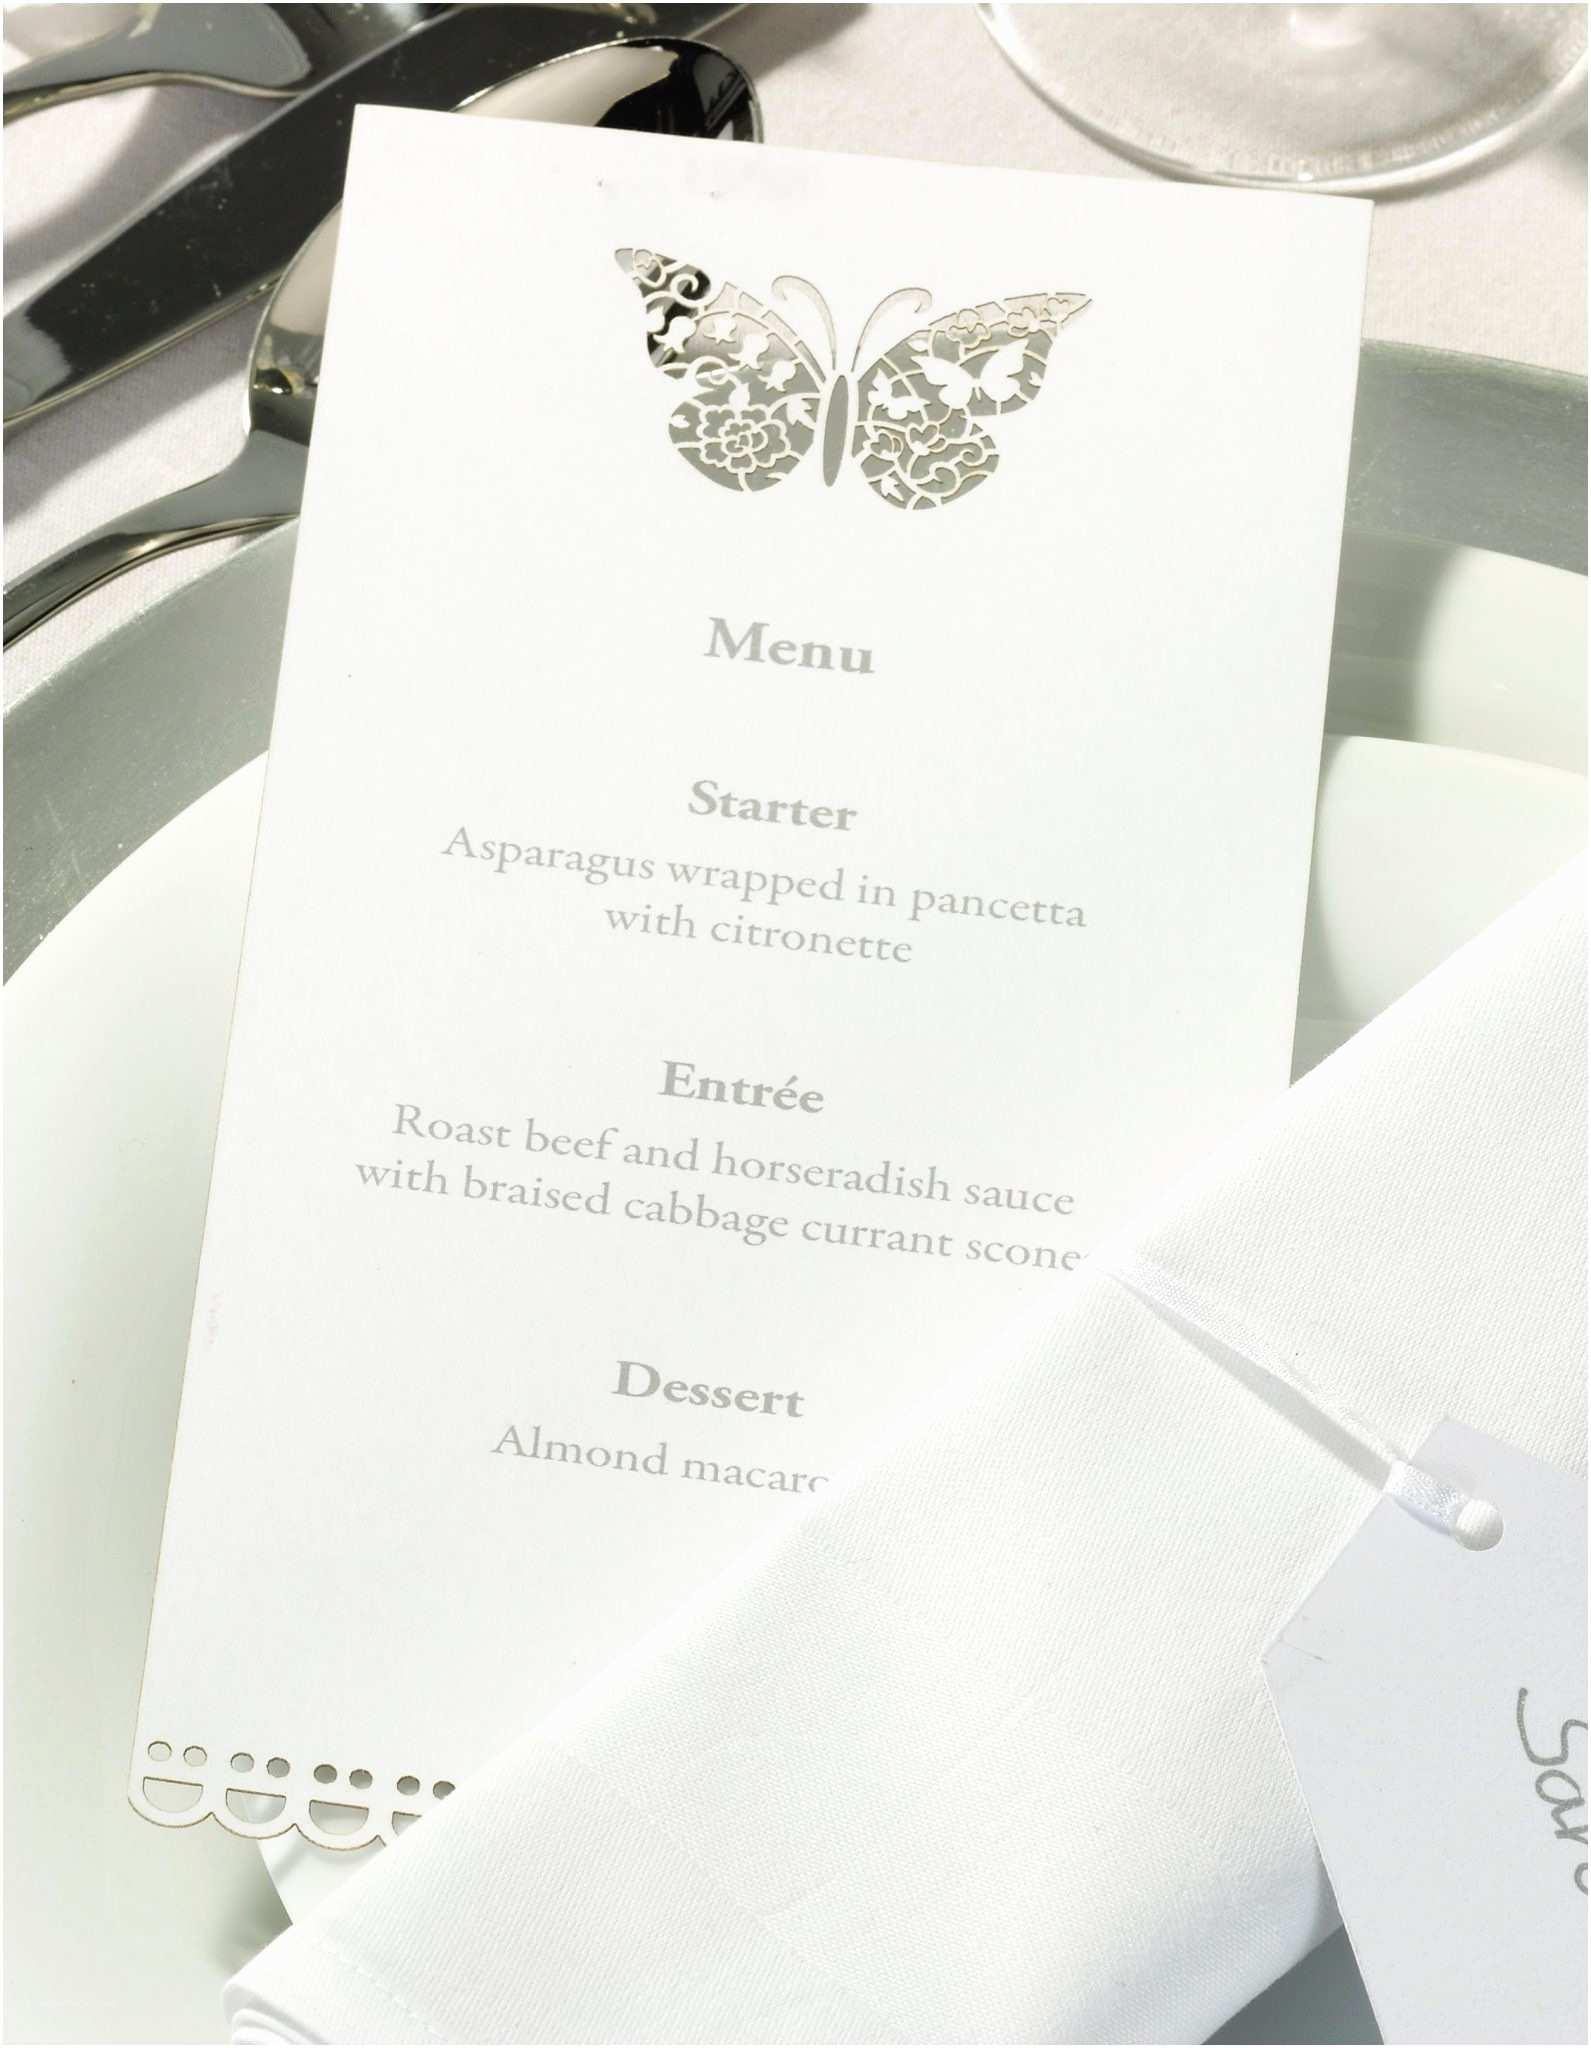 Wilton Wedding Invitations Wedding Invitation Printers Party for Kids Ideas and